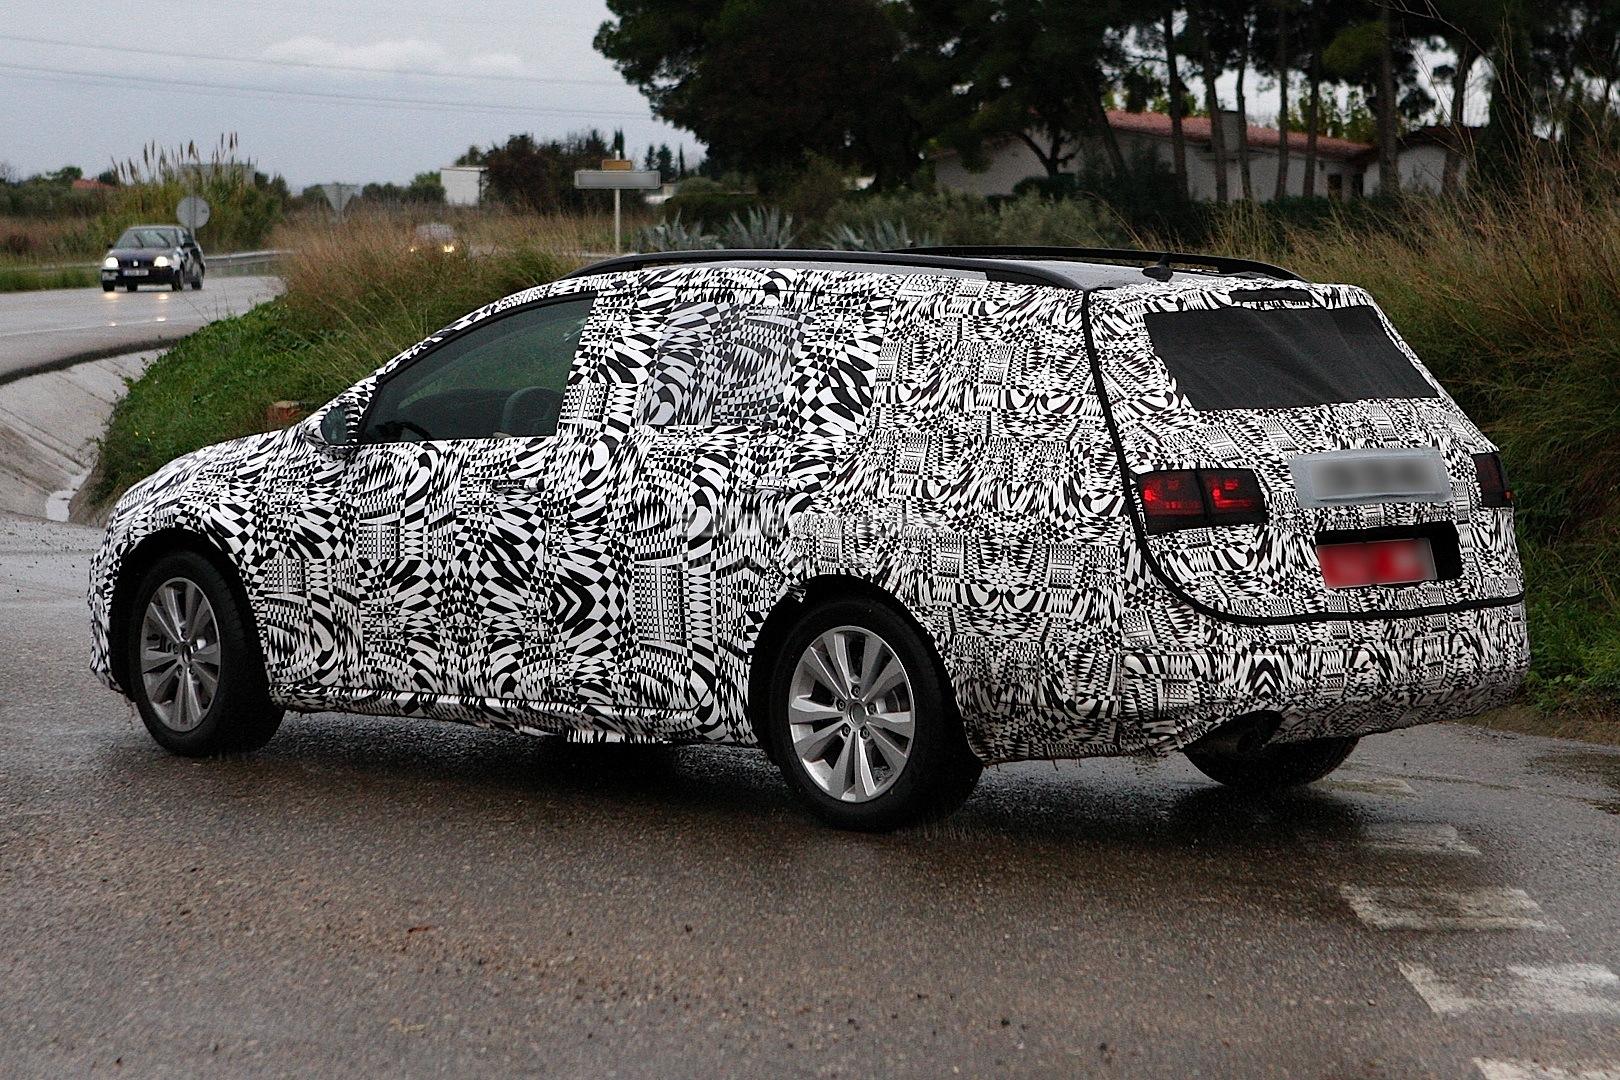 Spyshots: Volkswagen Golf Variant/Estate Spotted Testing - autoevolution